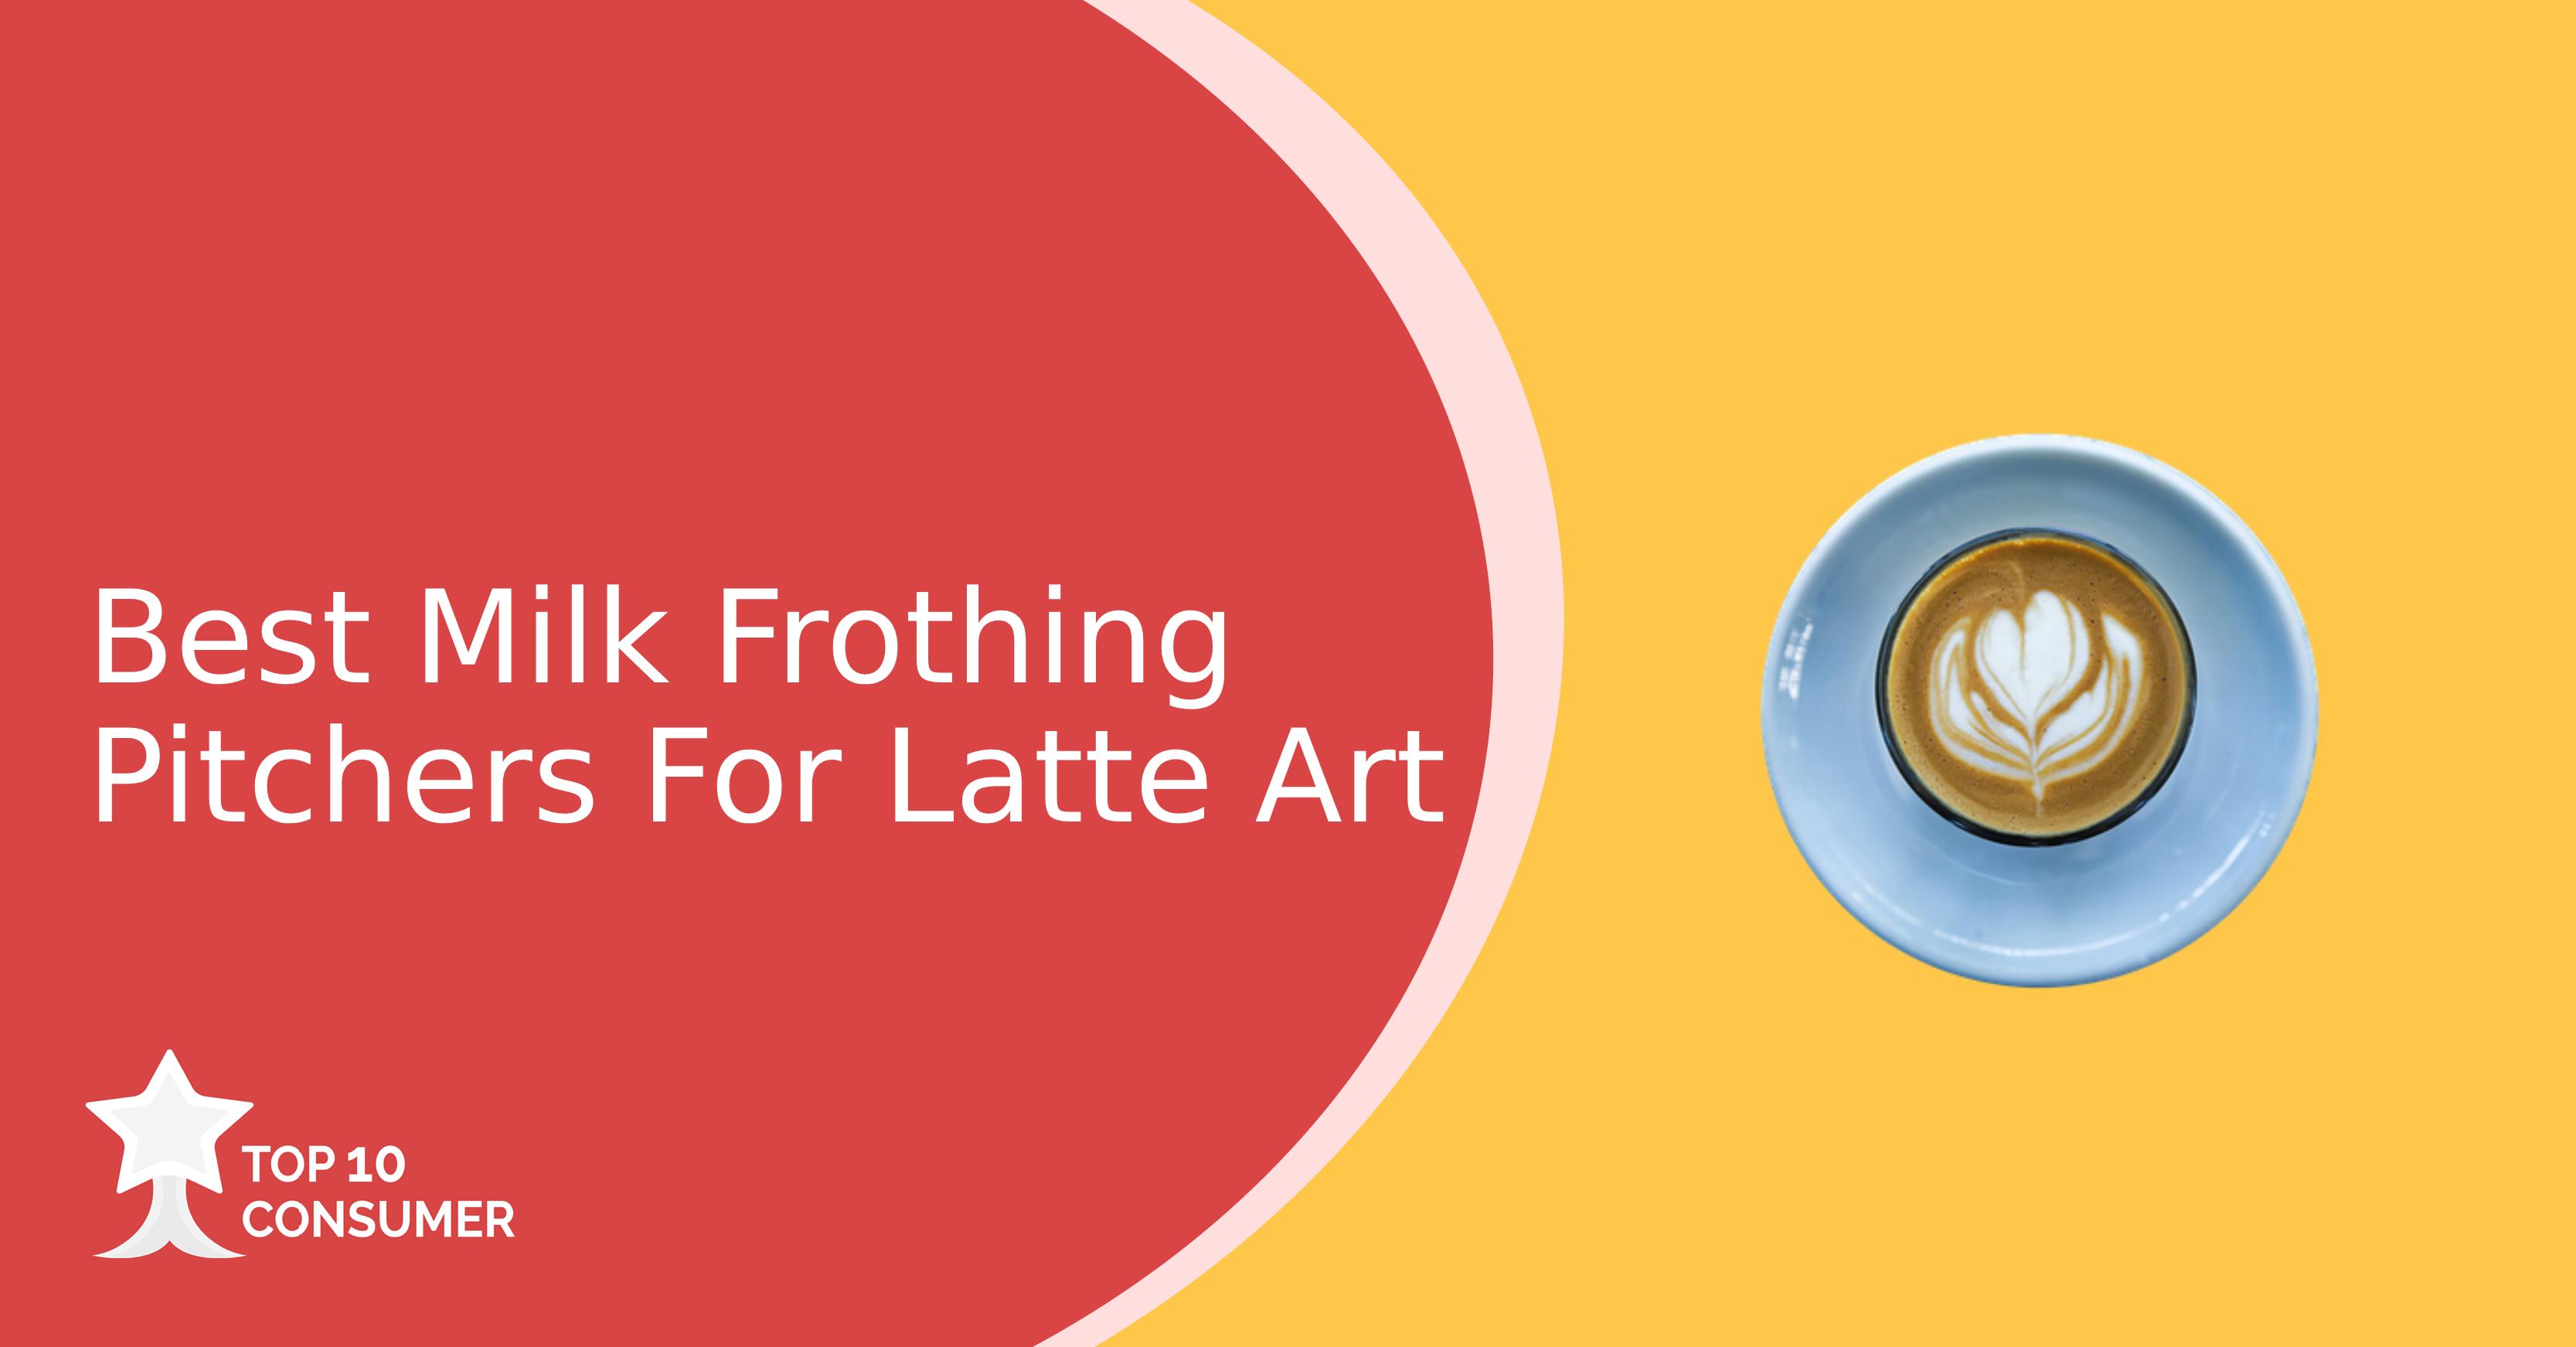 Best Milk Frothing Pitcher For Latte Art